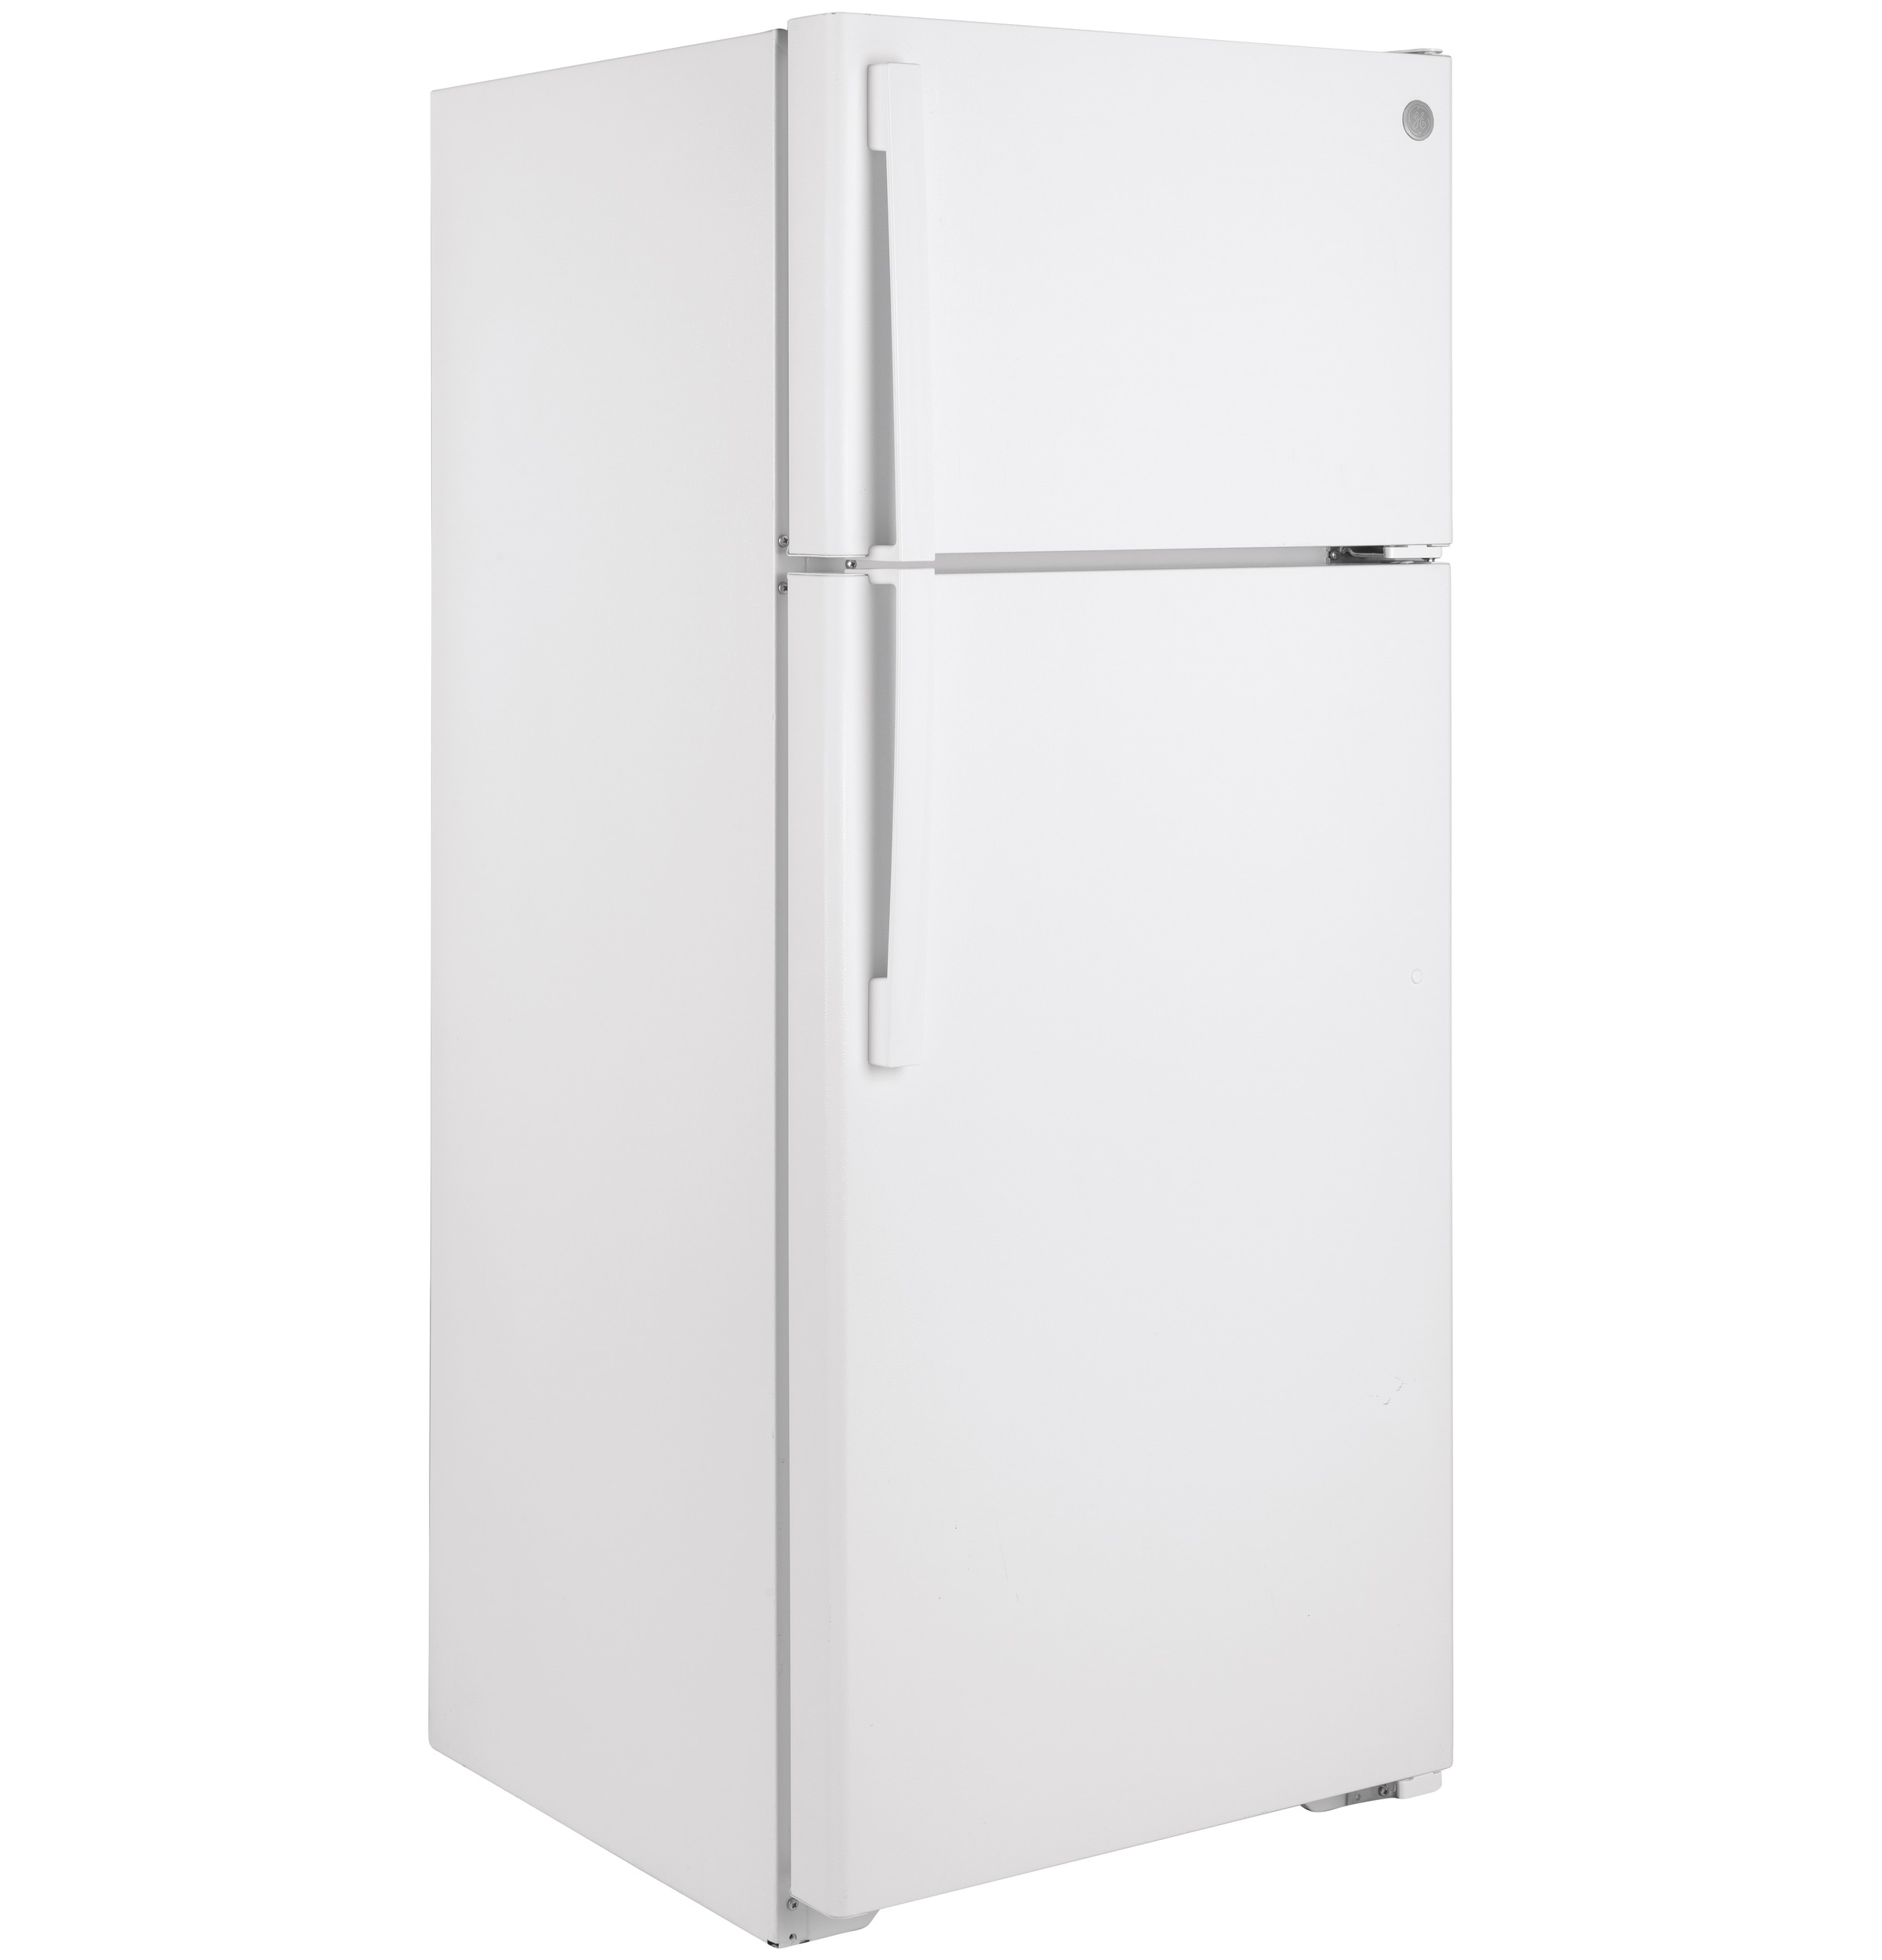 Model: GIE18GTNRWW   GE GE® ENERGY STAR® 17.5 Cu. Ft. Top-Freezer Refrigerator